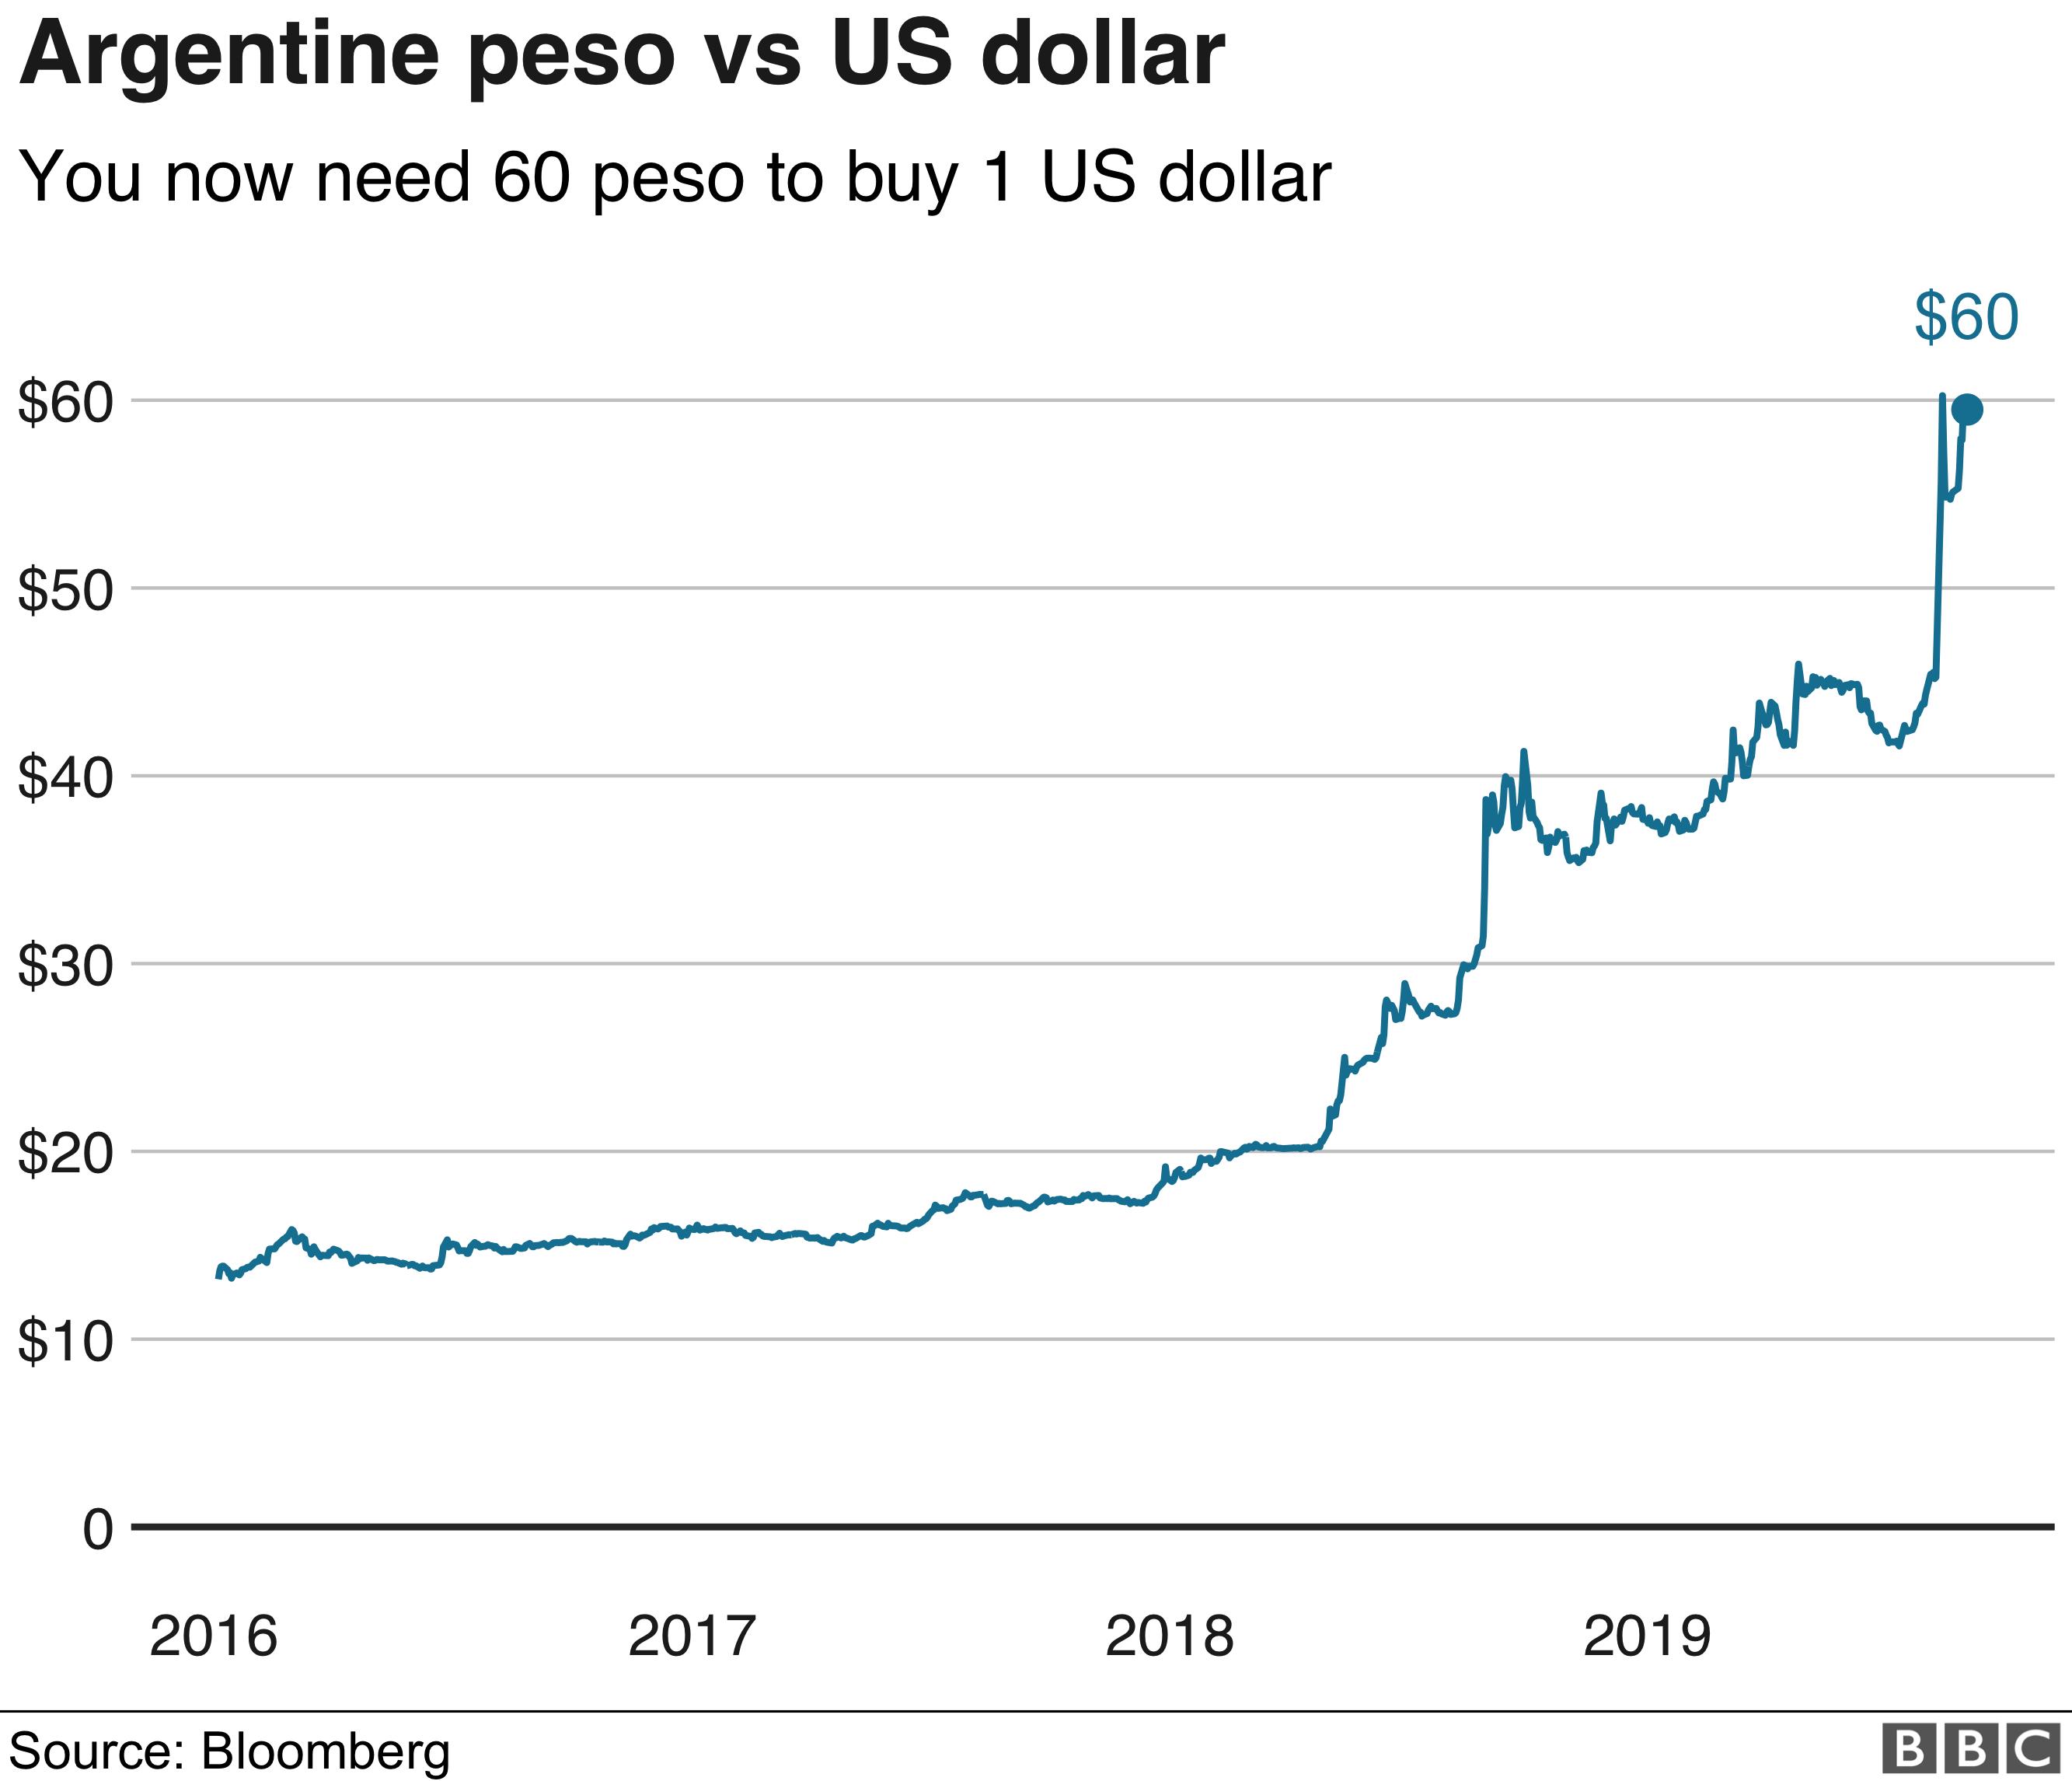 Peso vs US Dollar